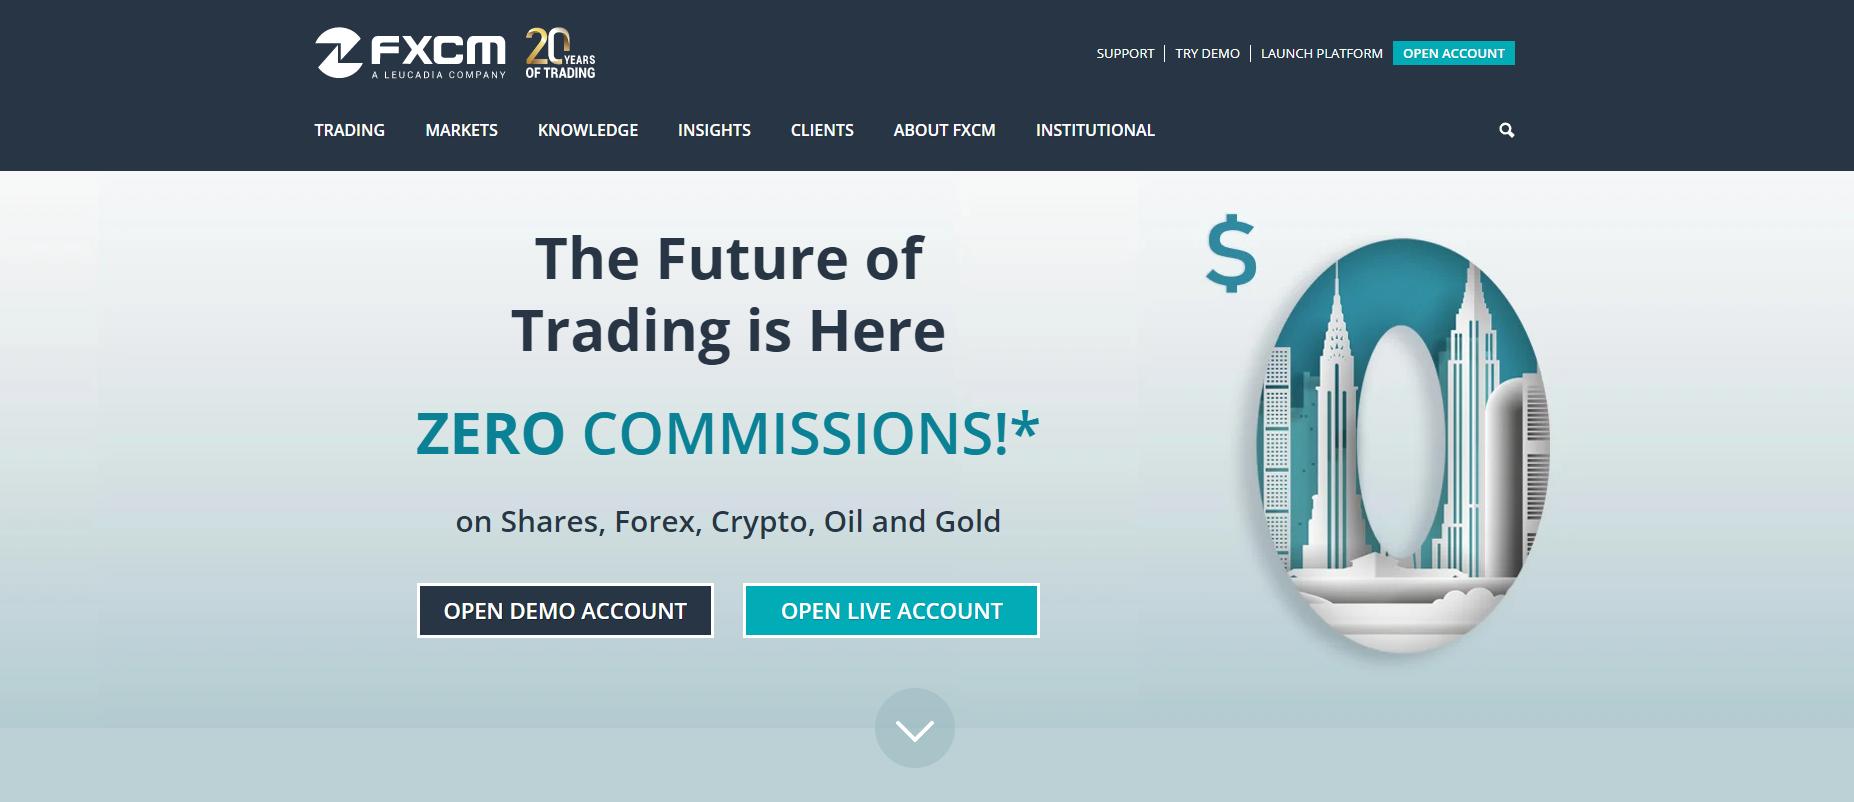 FXCM website